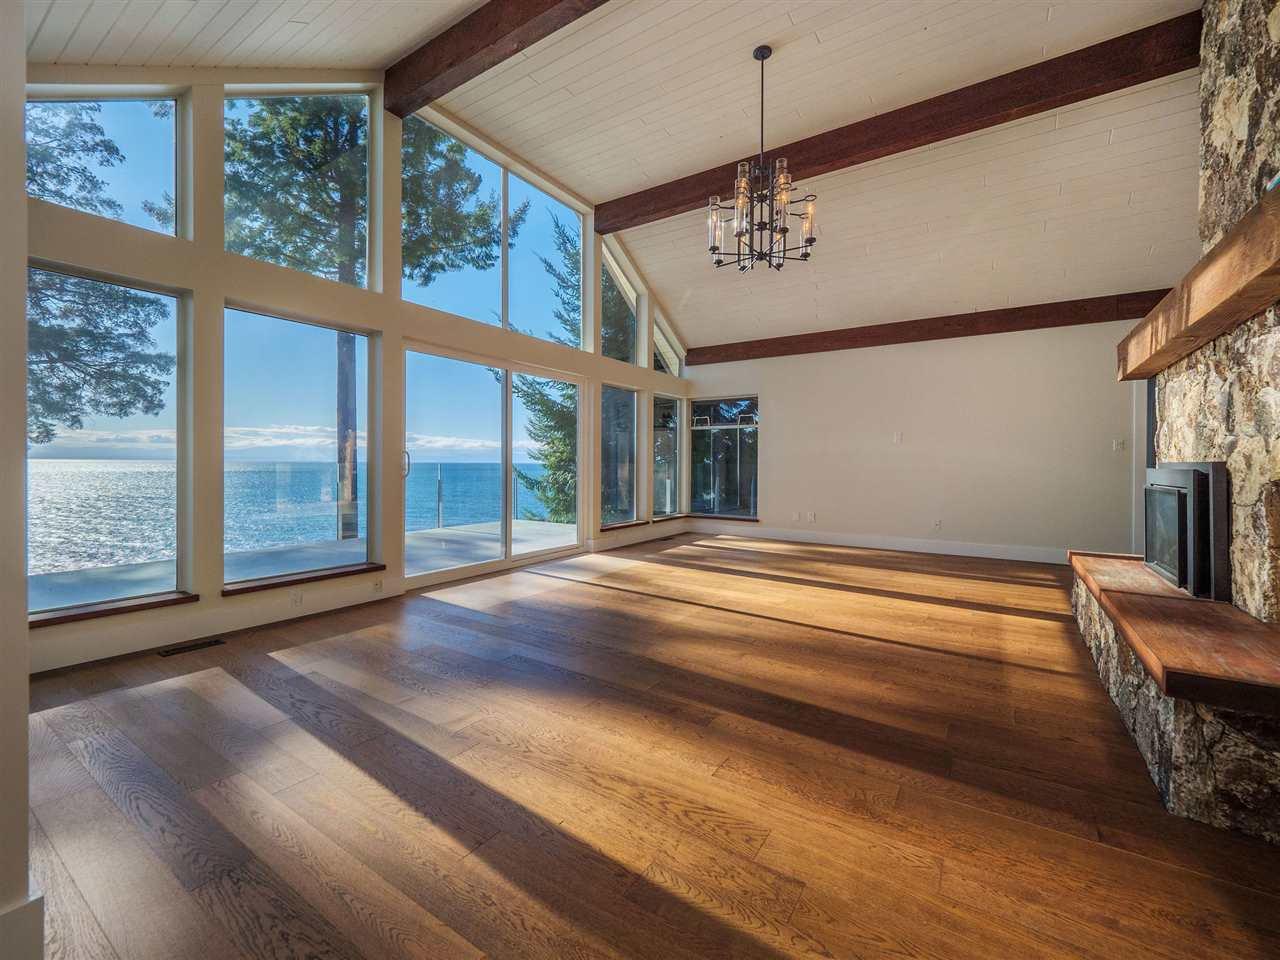 "Photo 22: Photos: 7101 DALE Road in Sechelt: Sechelt District House for sale in ""Caleda Estates"" (Sunshine Coast)  : MLS®# R2515160"